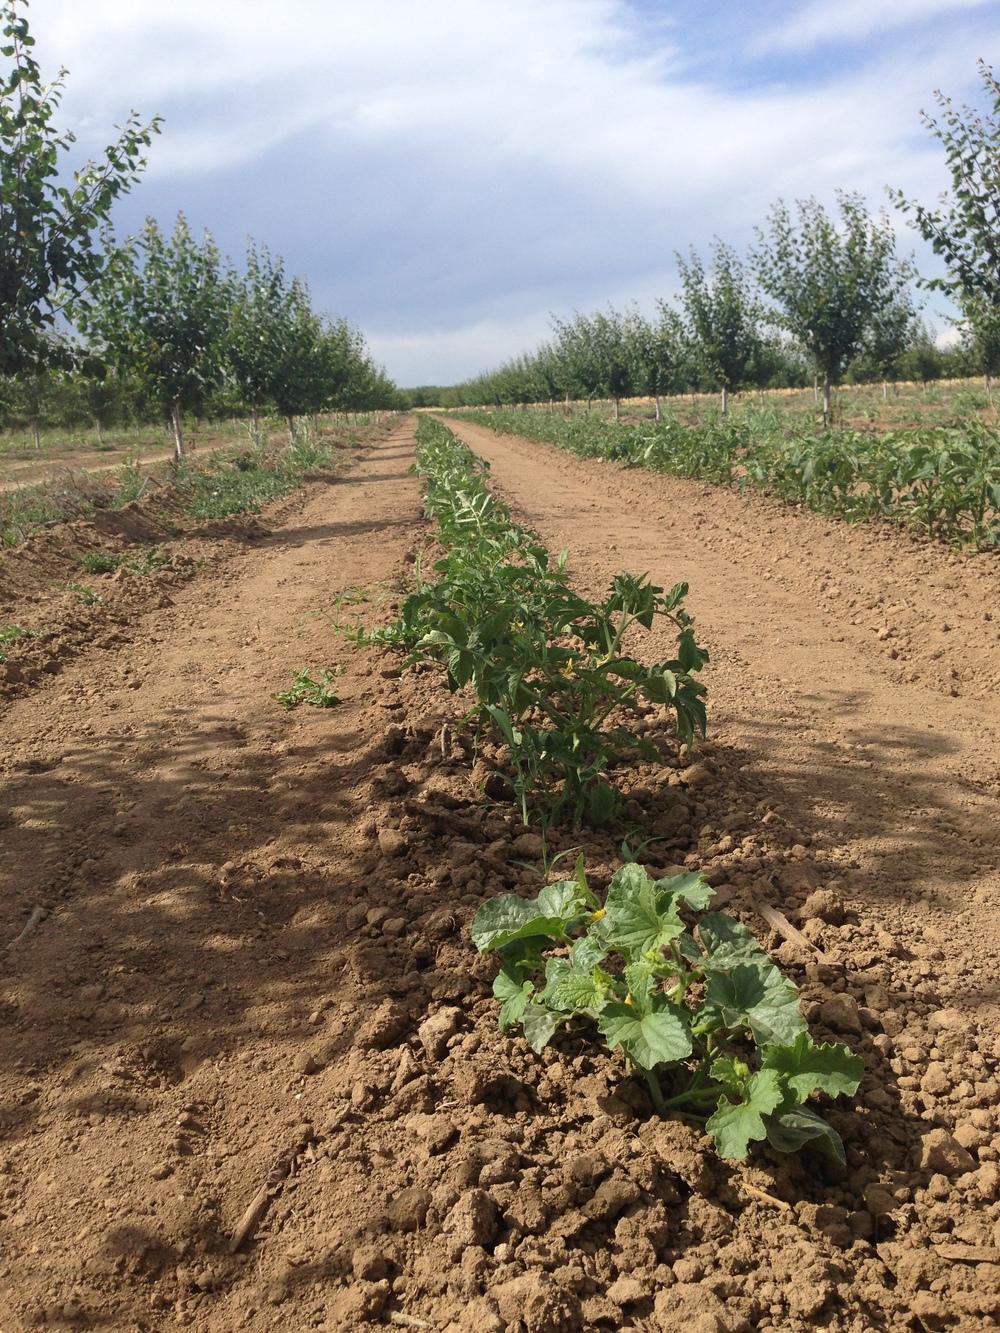 A Row of Melon Plants